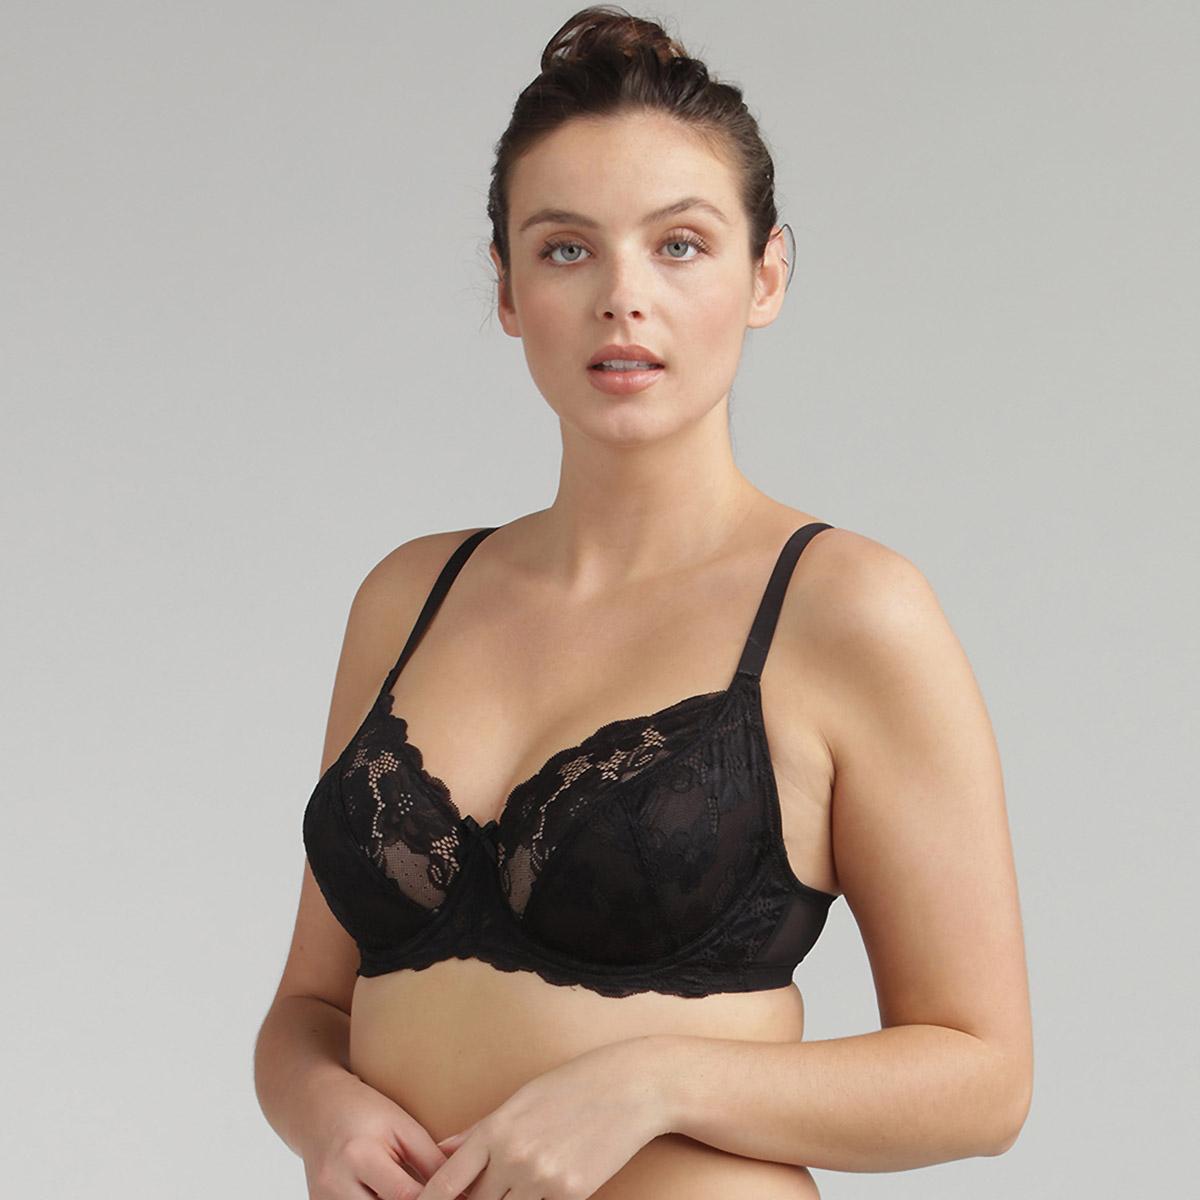 Soutien-gorge dentelle corbeille noir Essential Elegance, , PLAYTEX